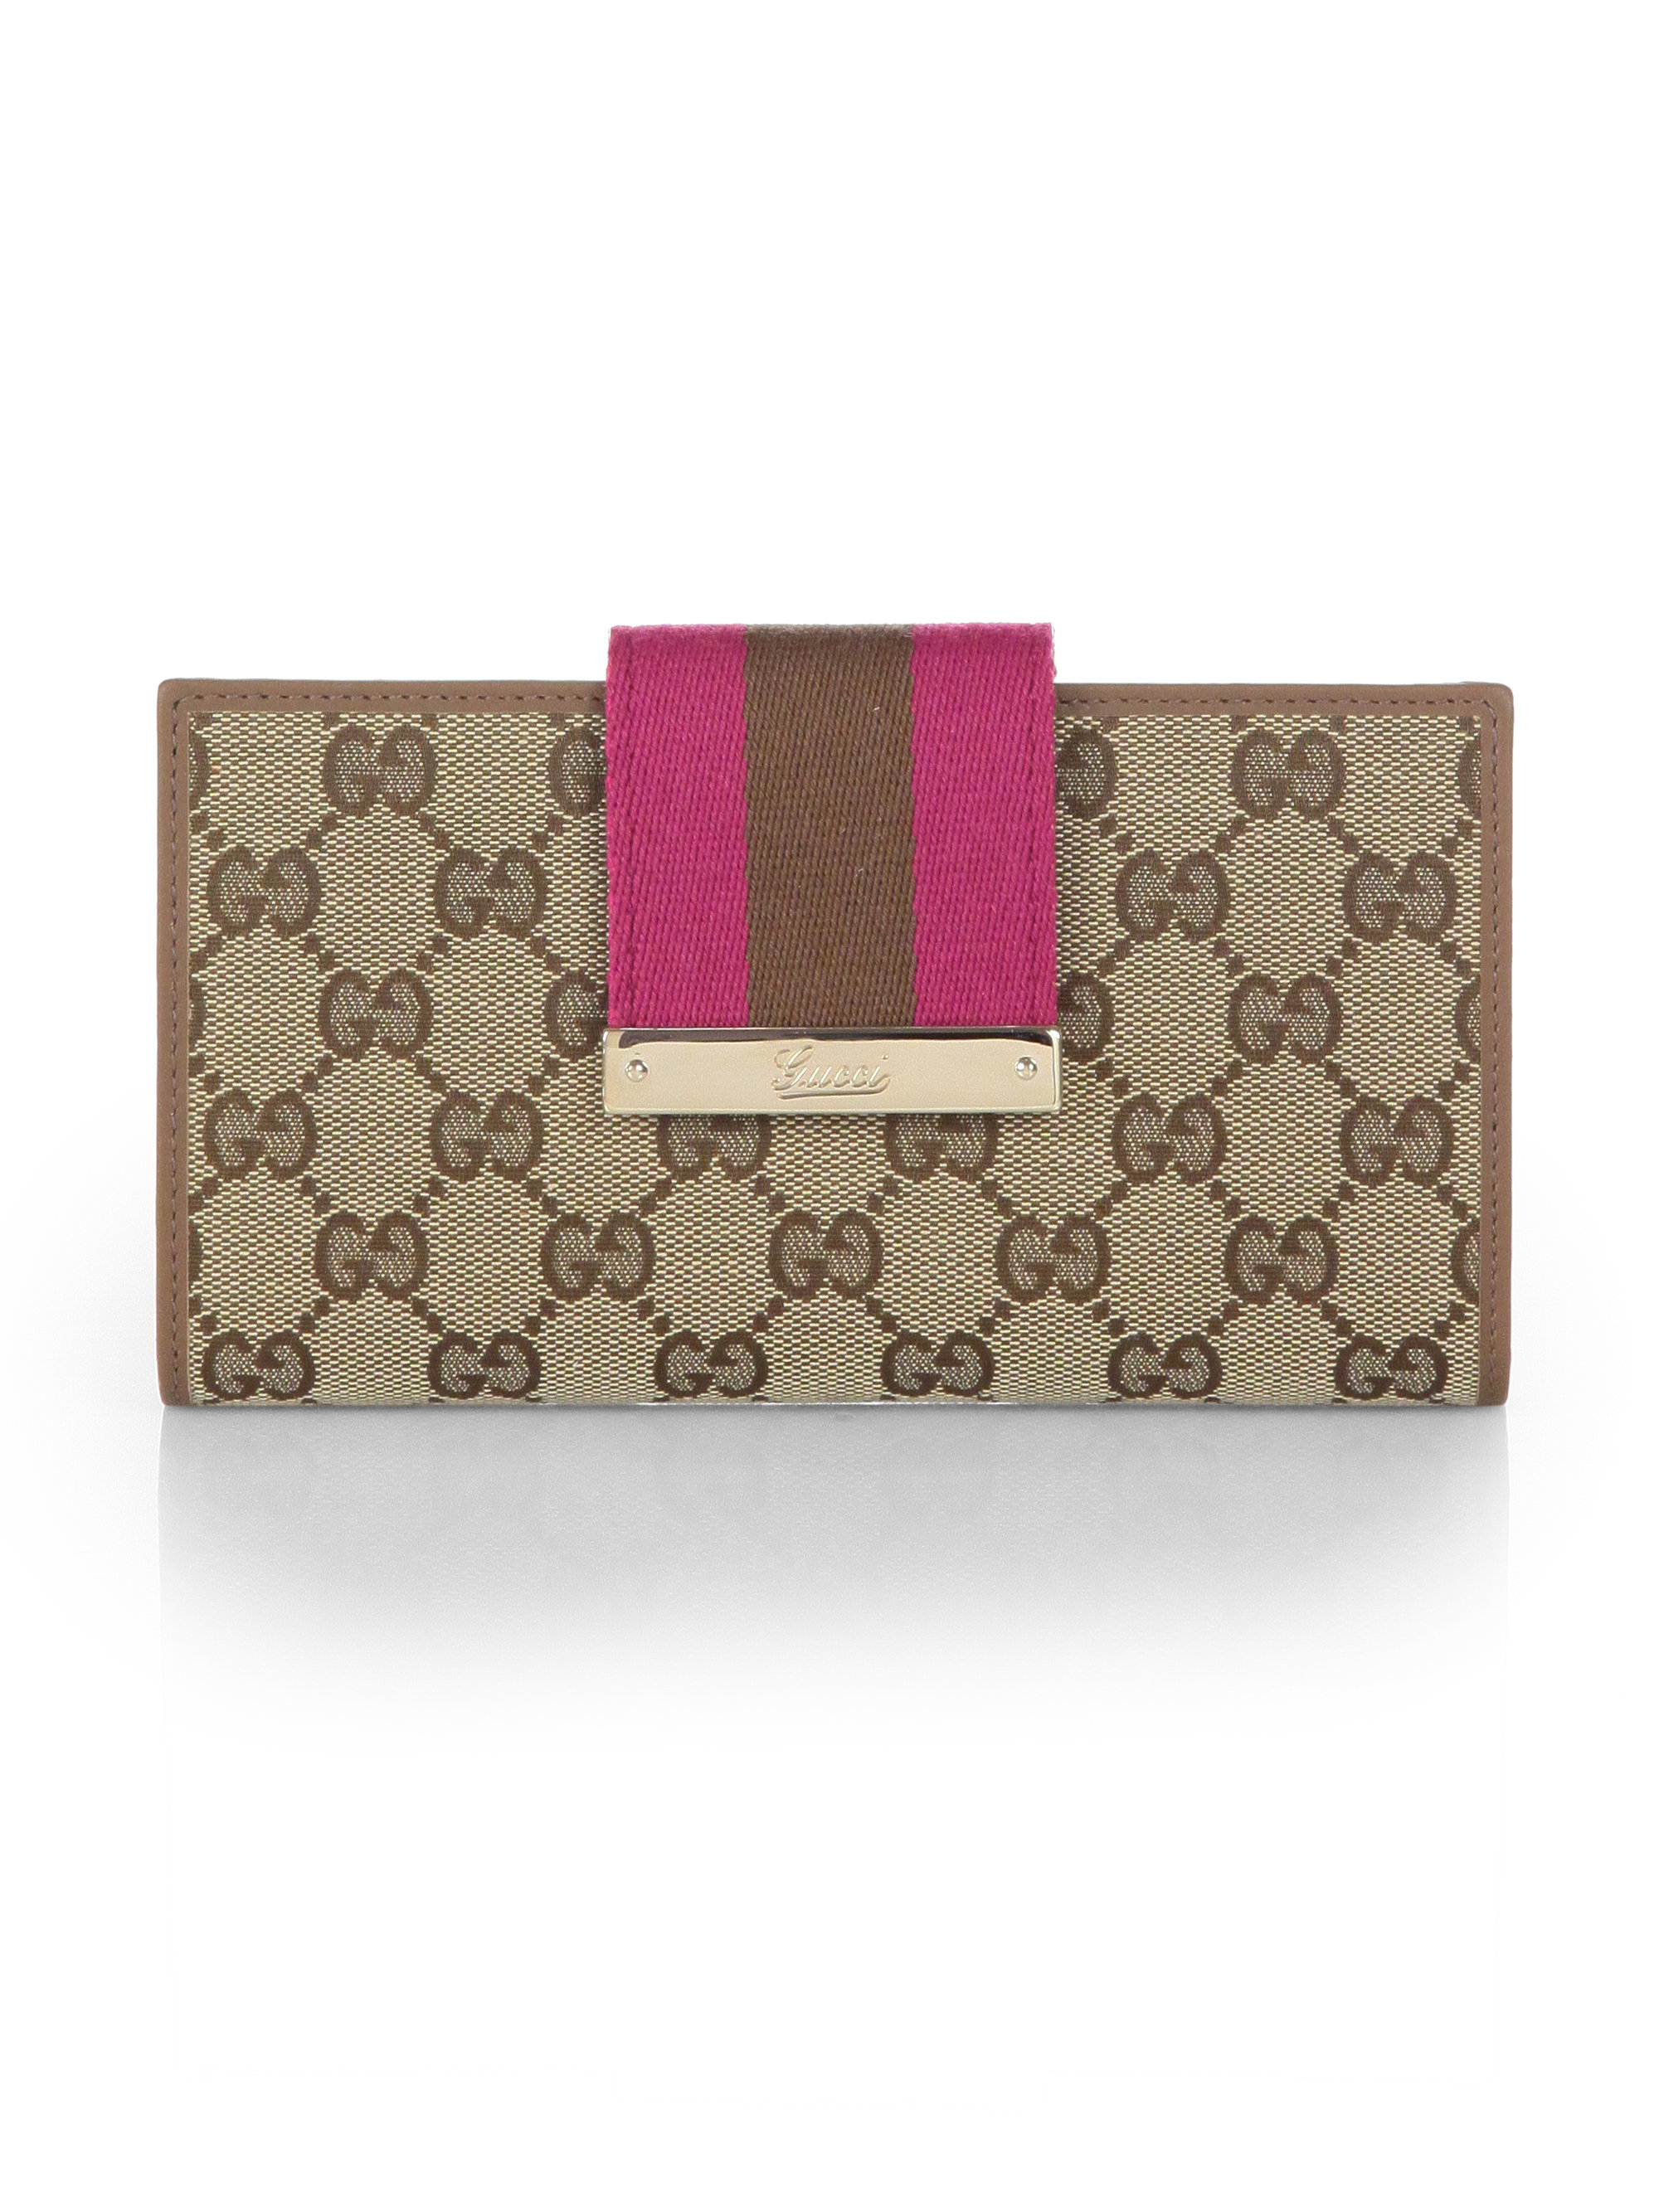 8e7c9cfb6ba9 Gucci Ladies Web Original Gg Canvas Continental Wallet in Brown - Lyst